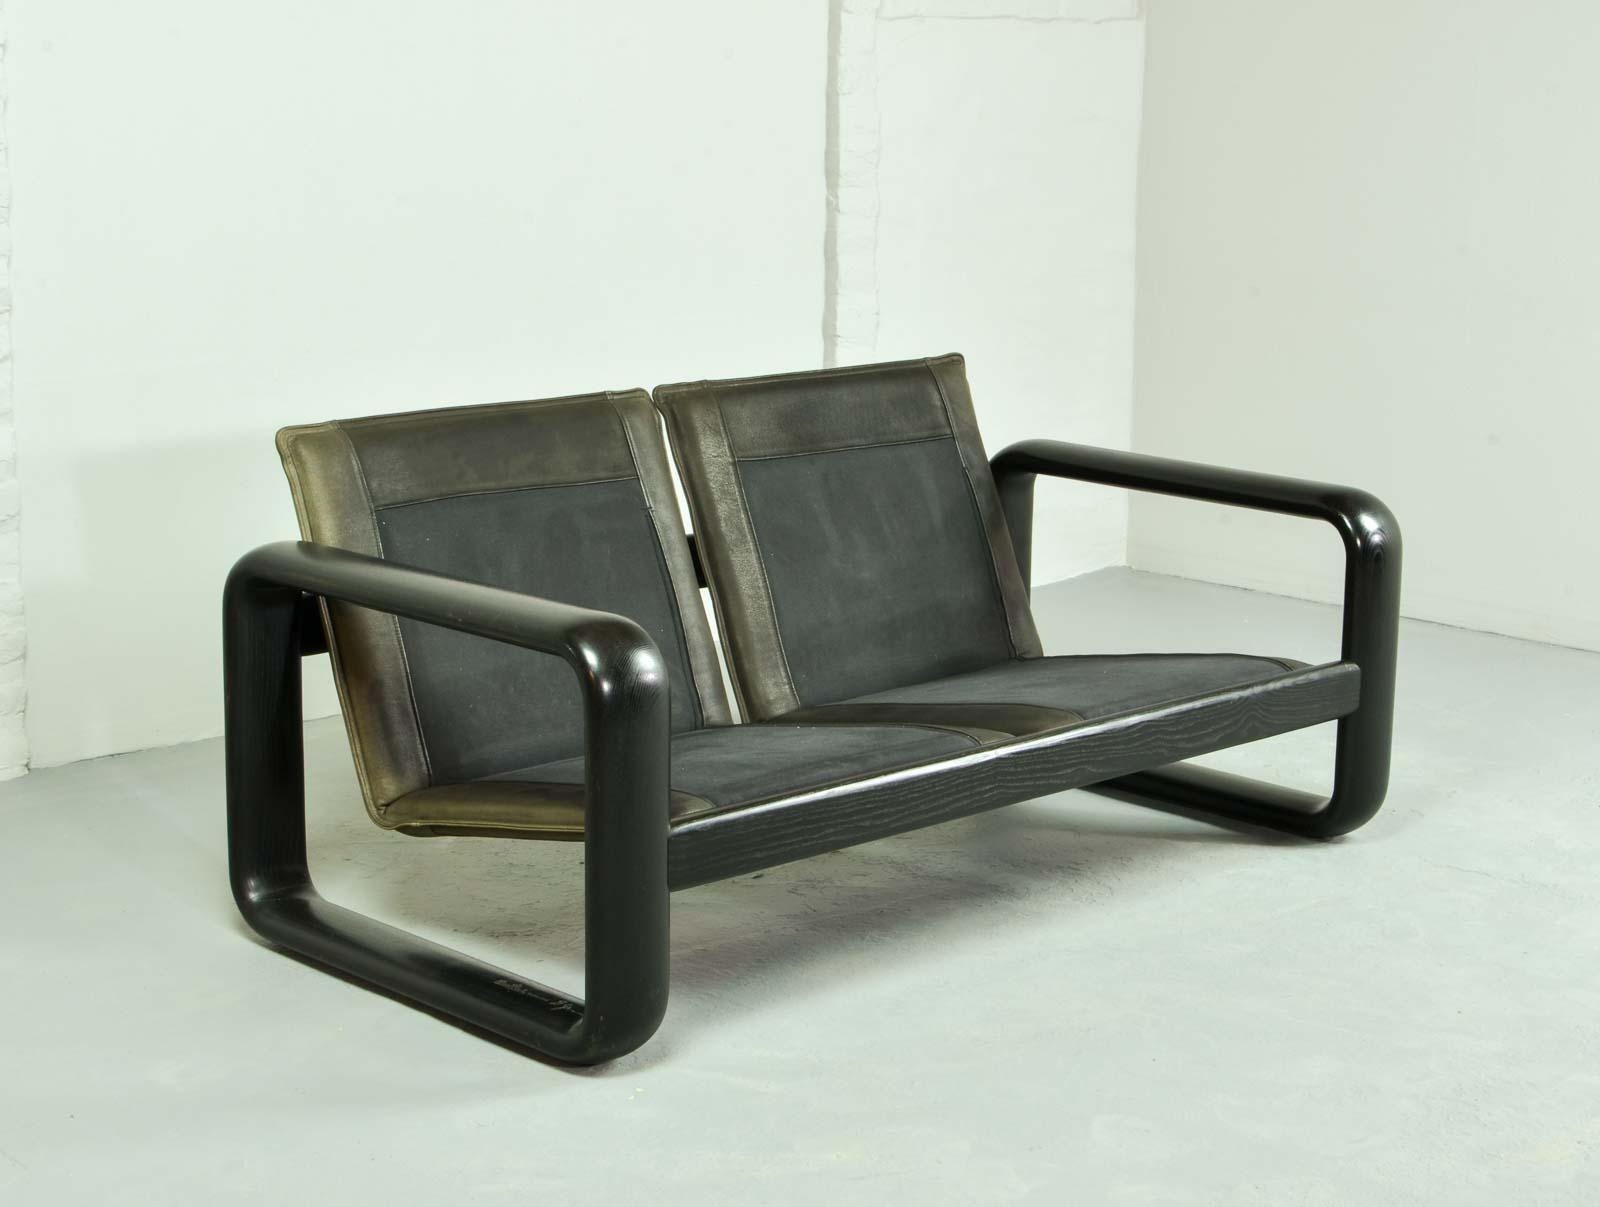 midcentury leather sofa by burkhard vogtherr for rosenthal studio line